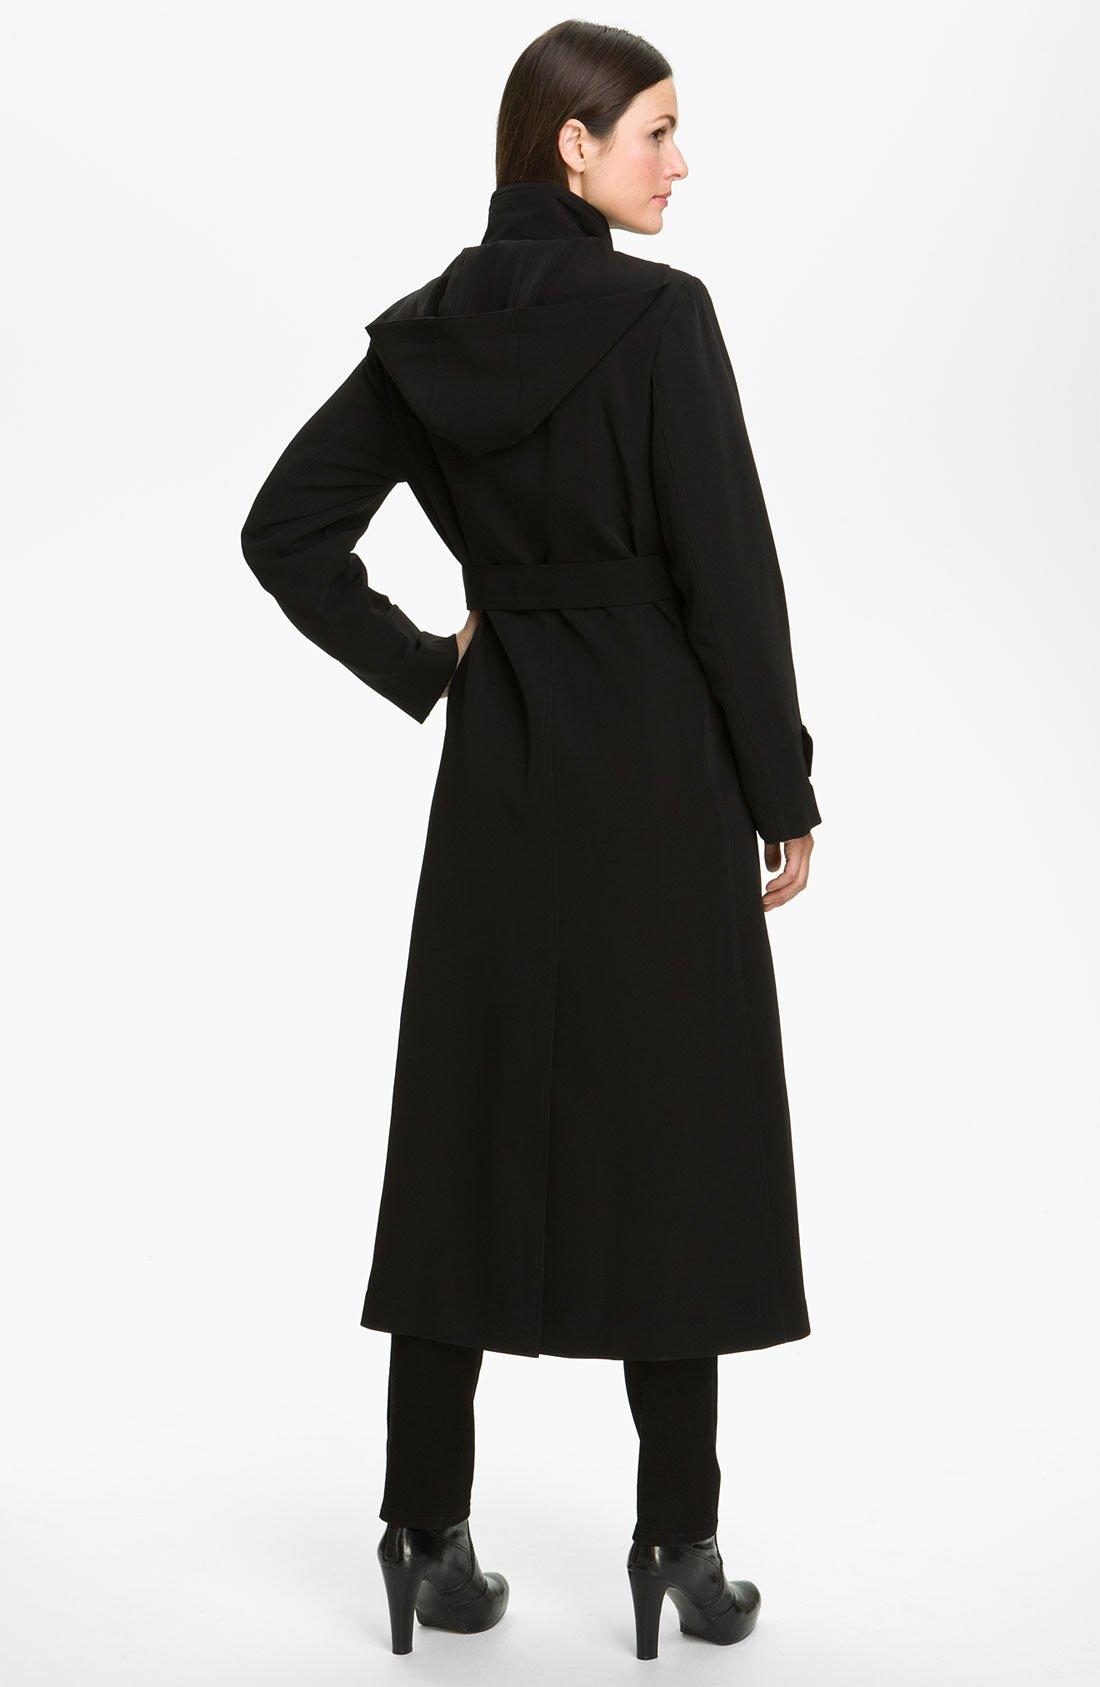 Long Coat With Hood - JacketIn